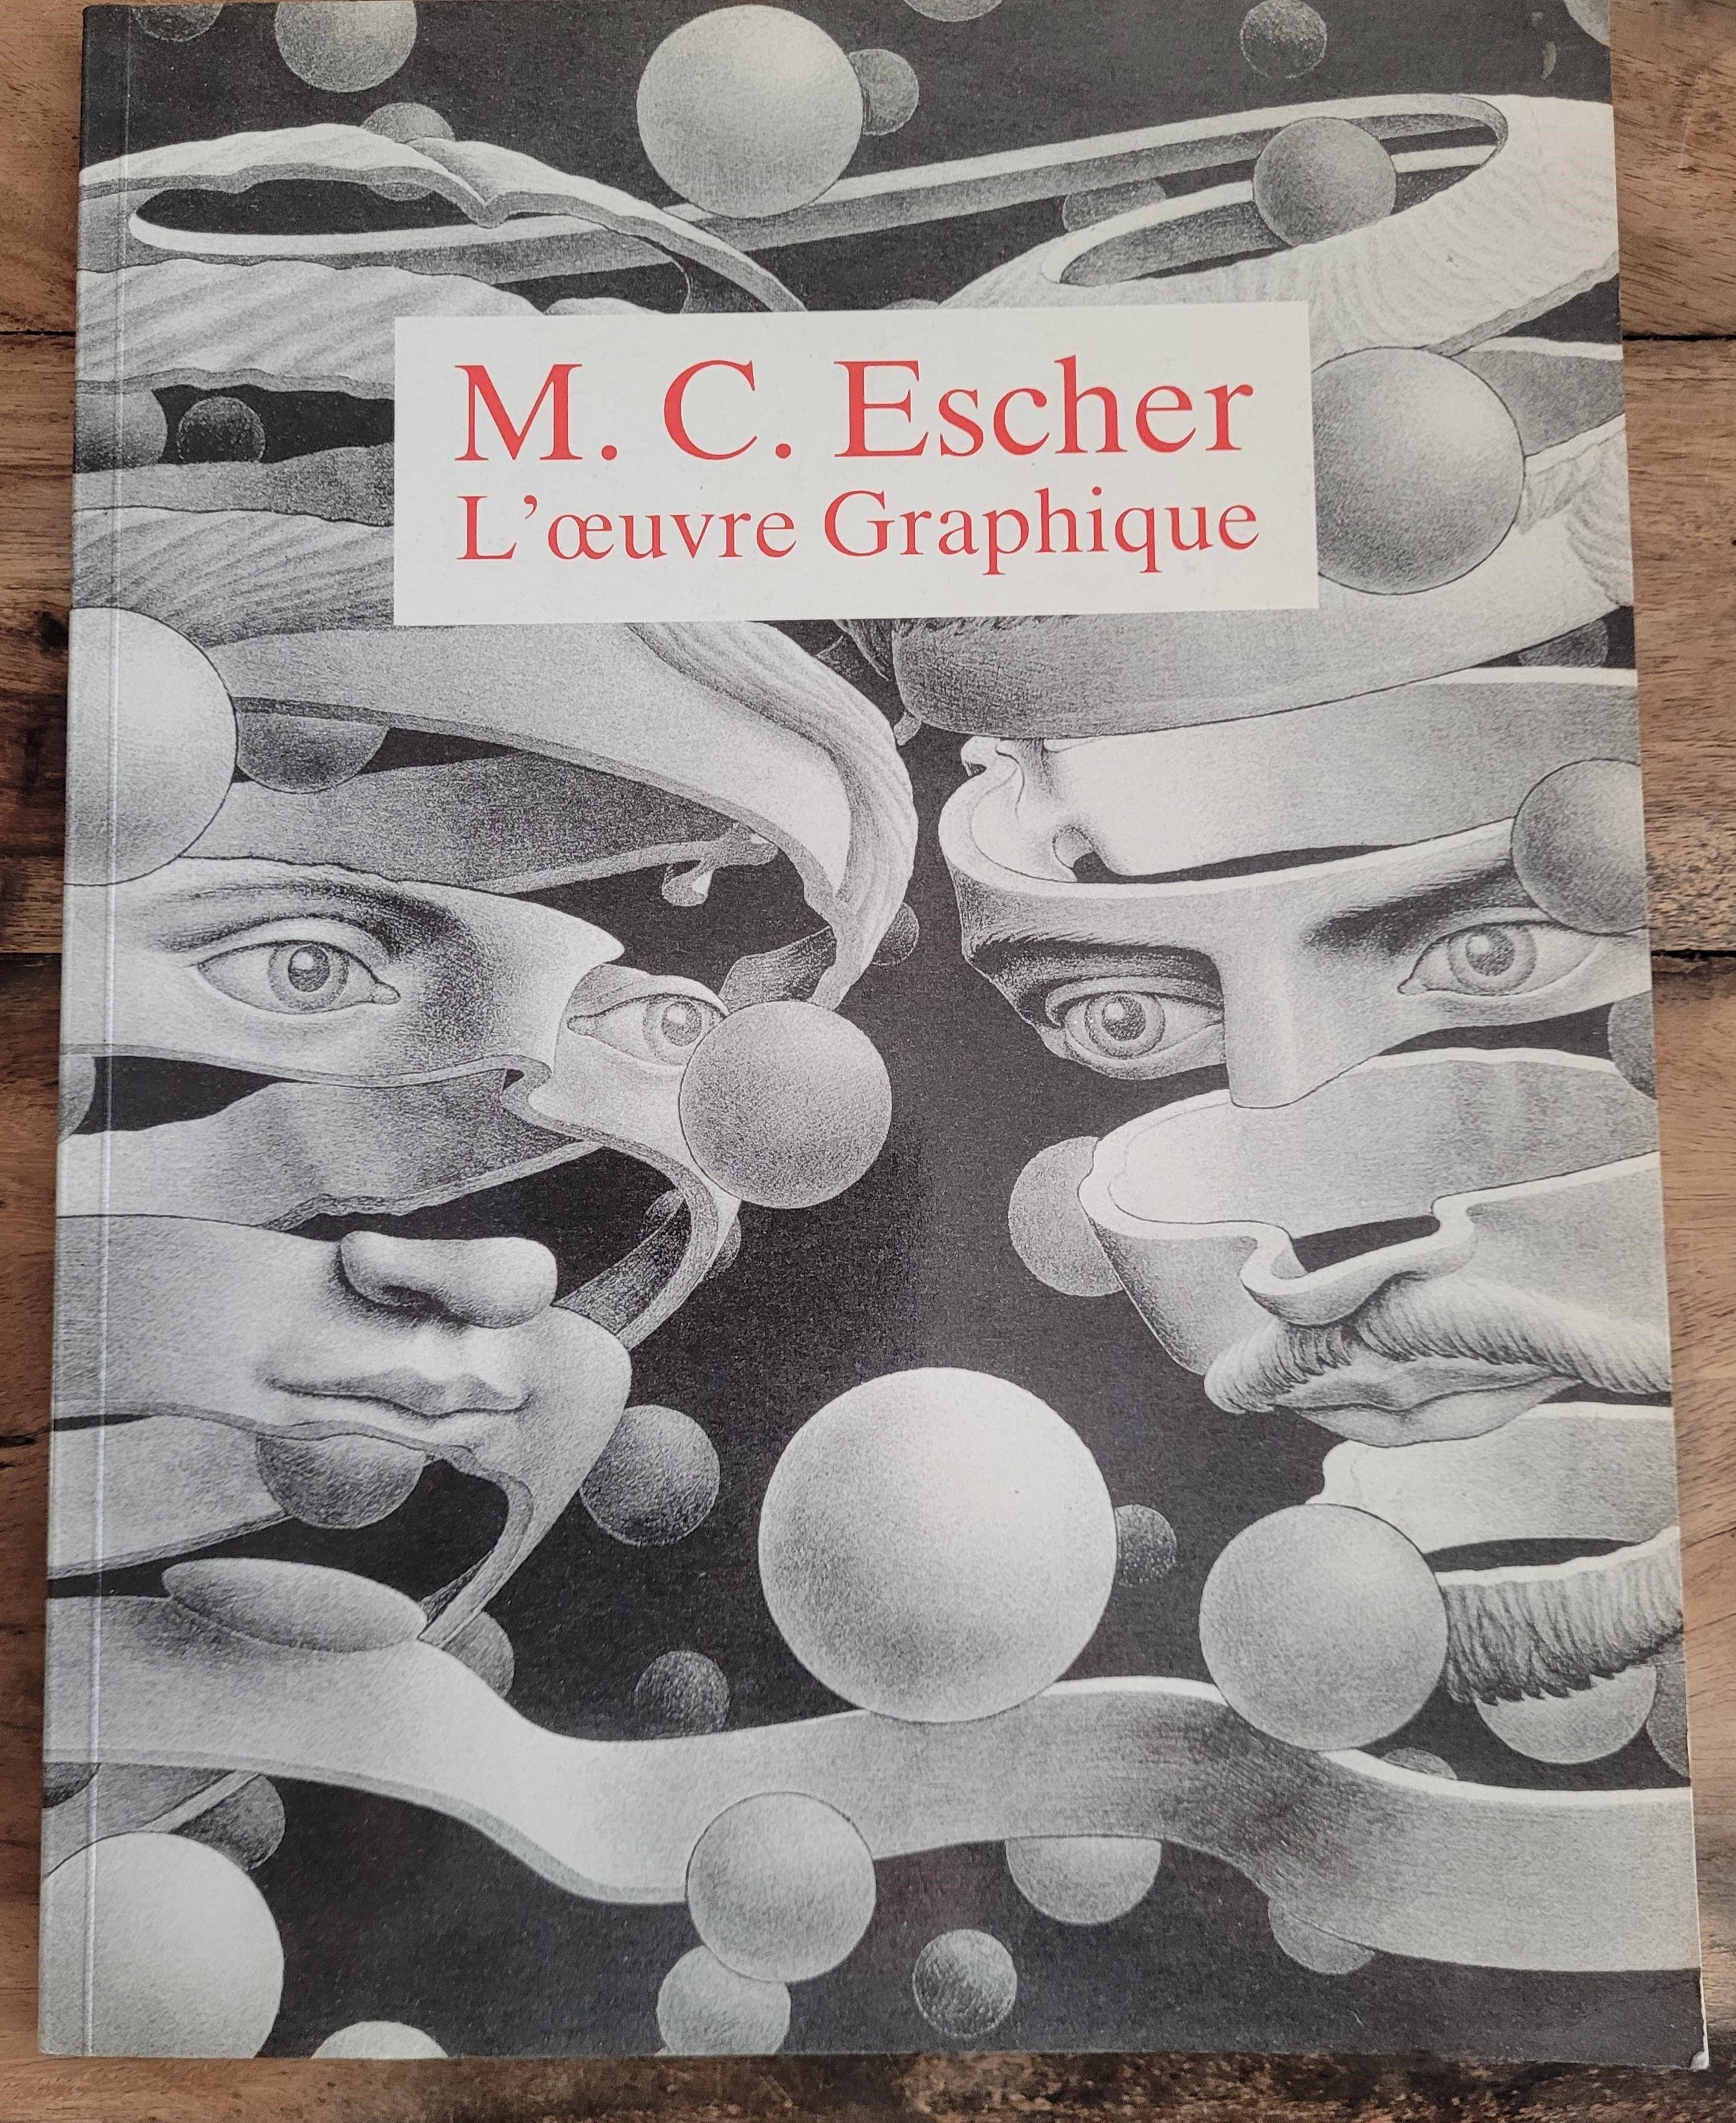 Vente livre Egon Schiele et M.C. Ecsher